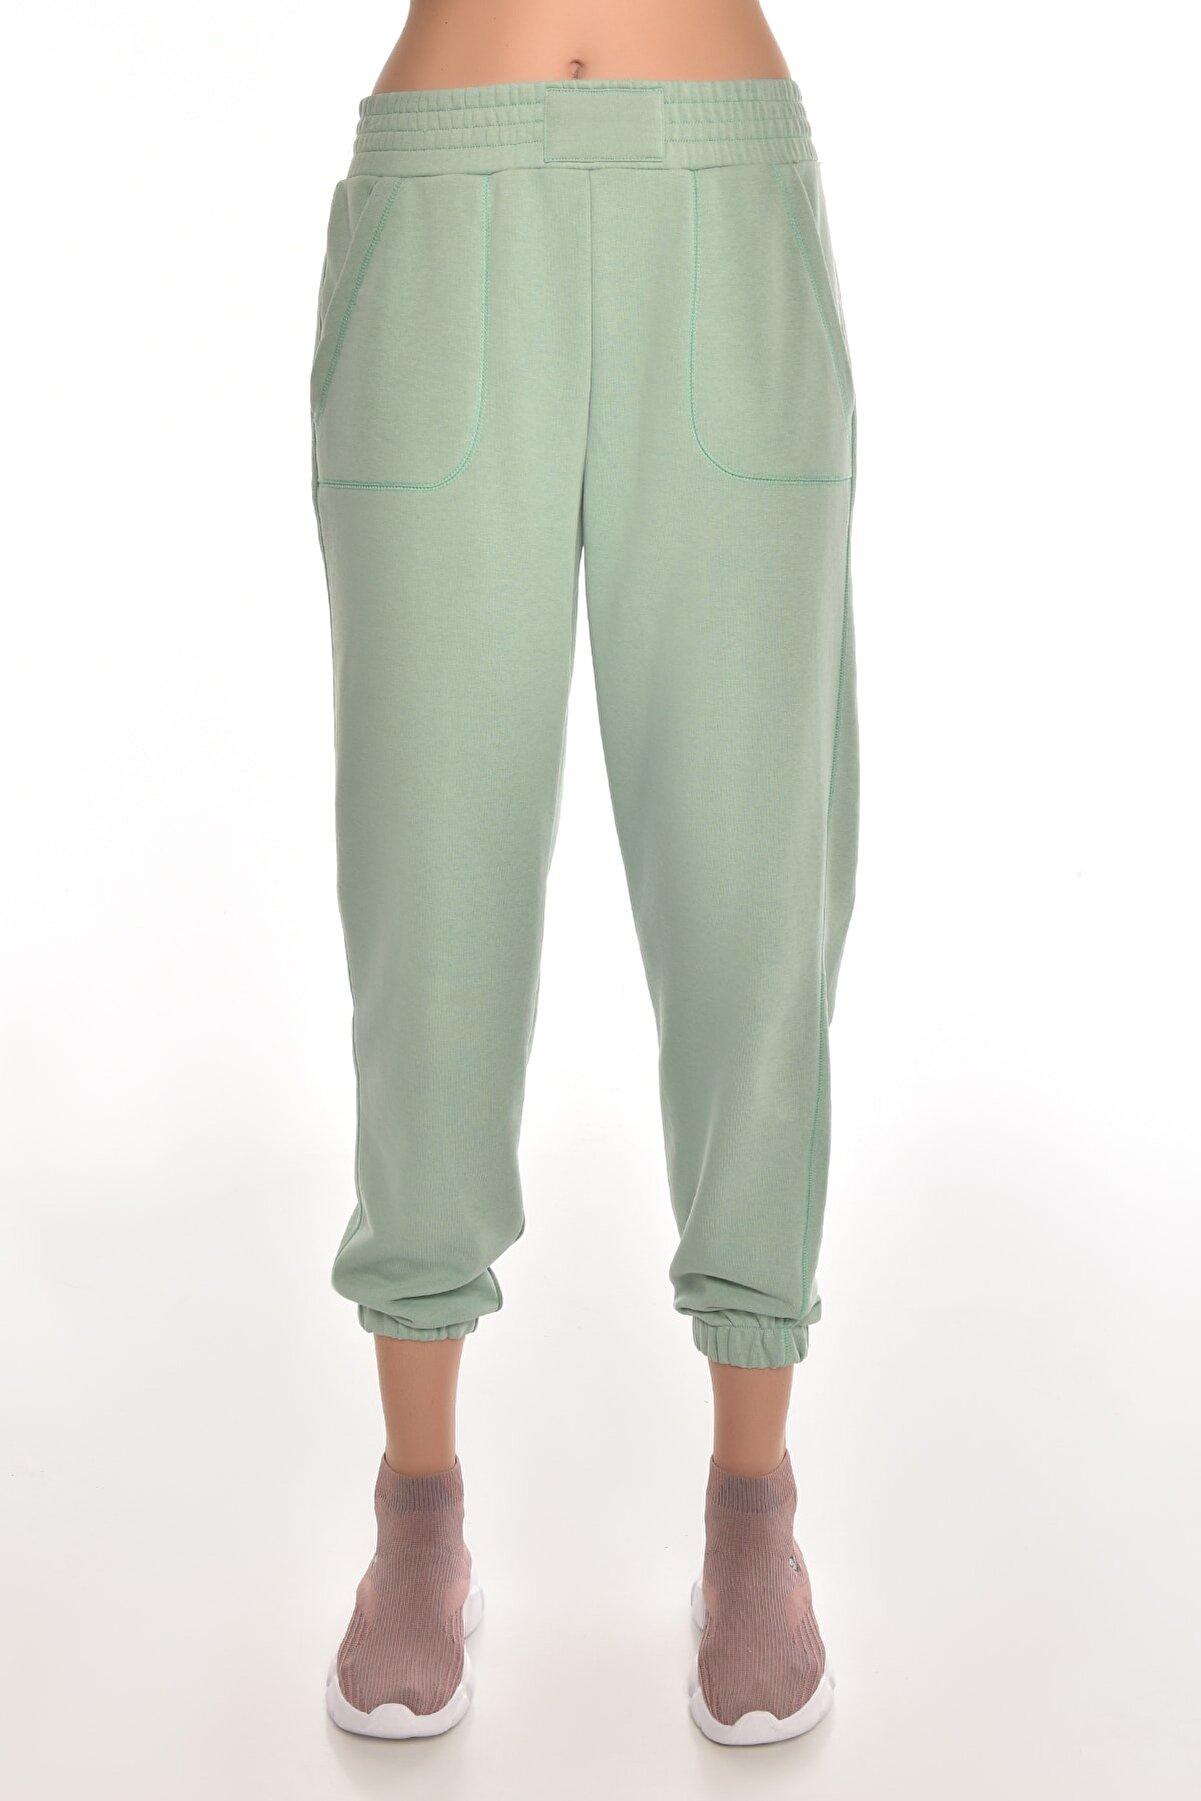 bilcee A.yeşil Kadın Jogger Eşofman Altı Gw-8999